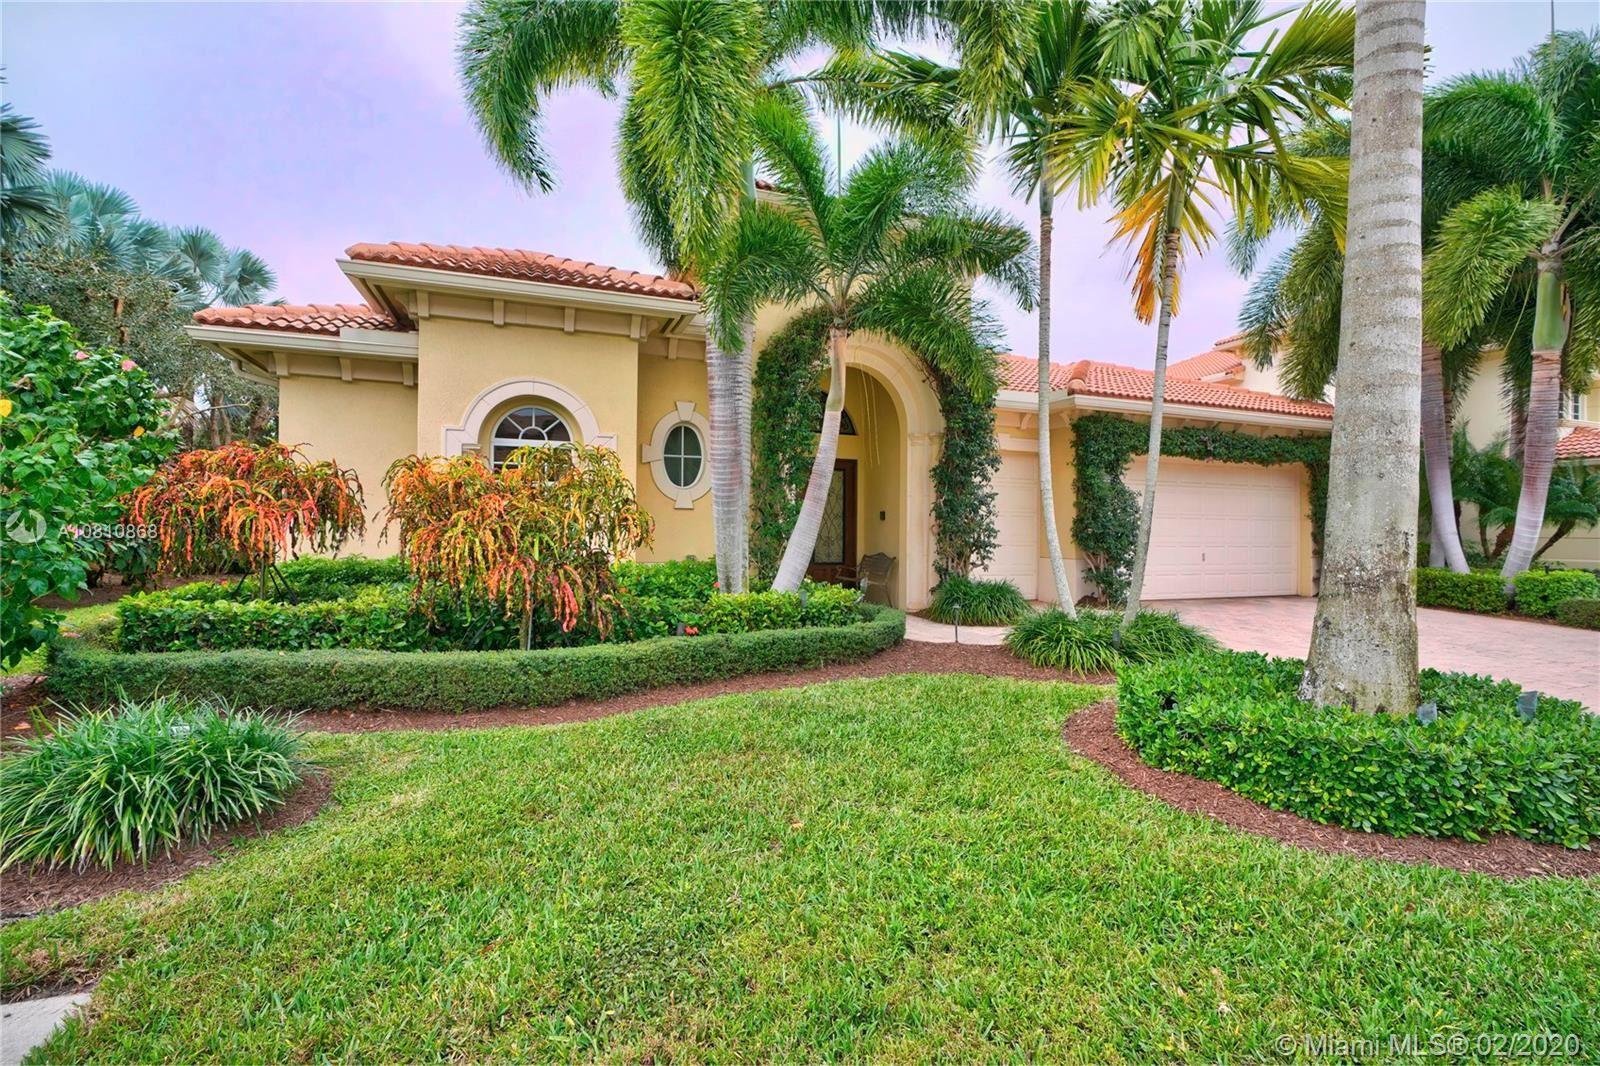 301 Charroux Dr, Palm Beach Gardens, FL 33410 - #: A10810868